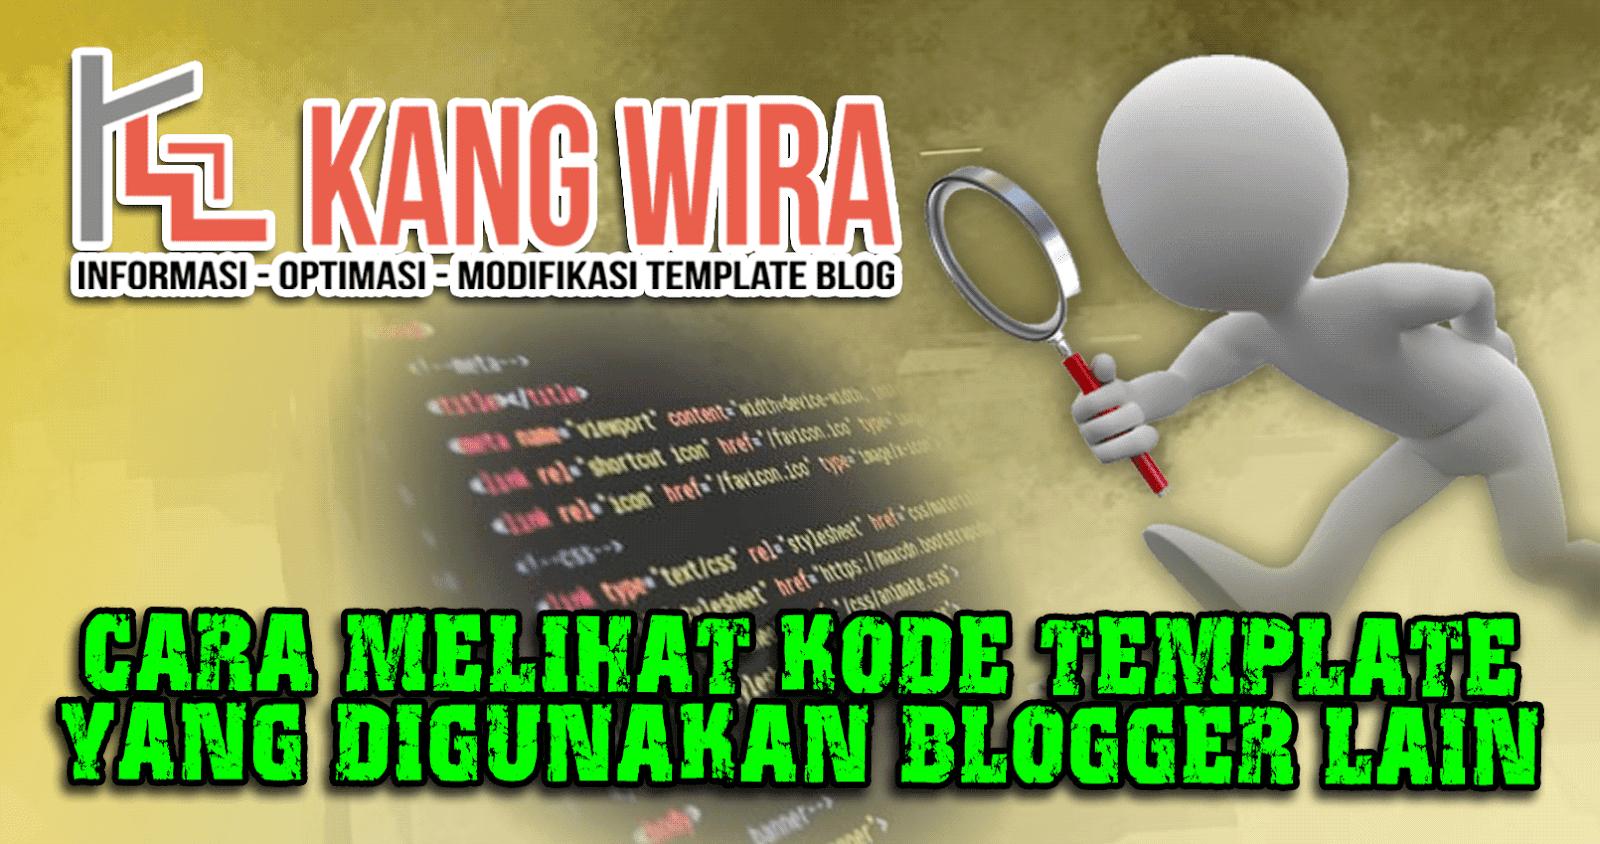 Cara Melihat Kode Template Yang Digunakan Blogger Lain